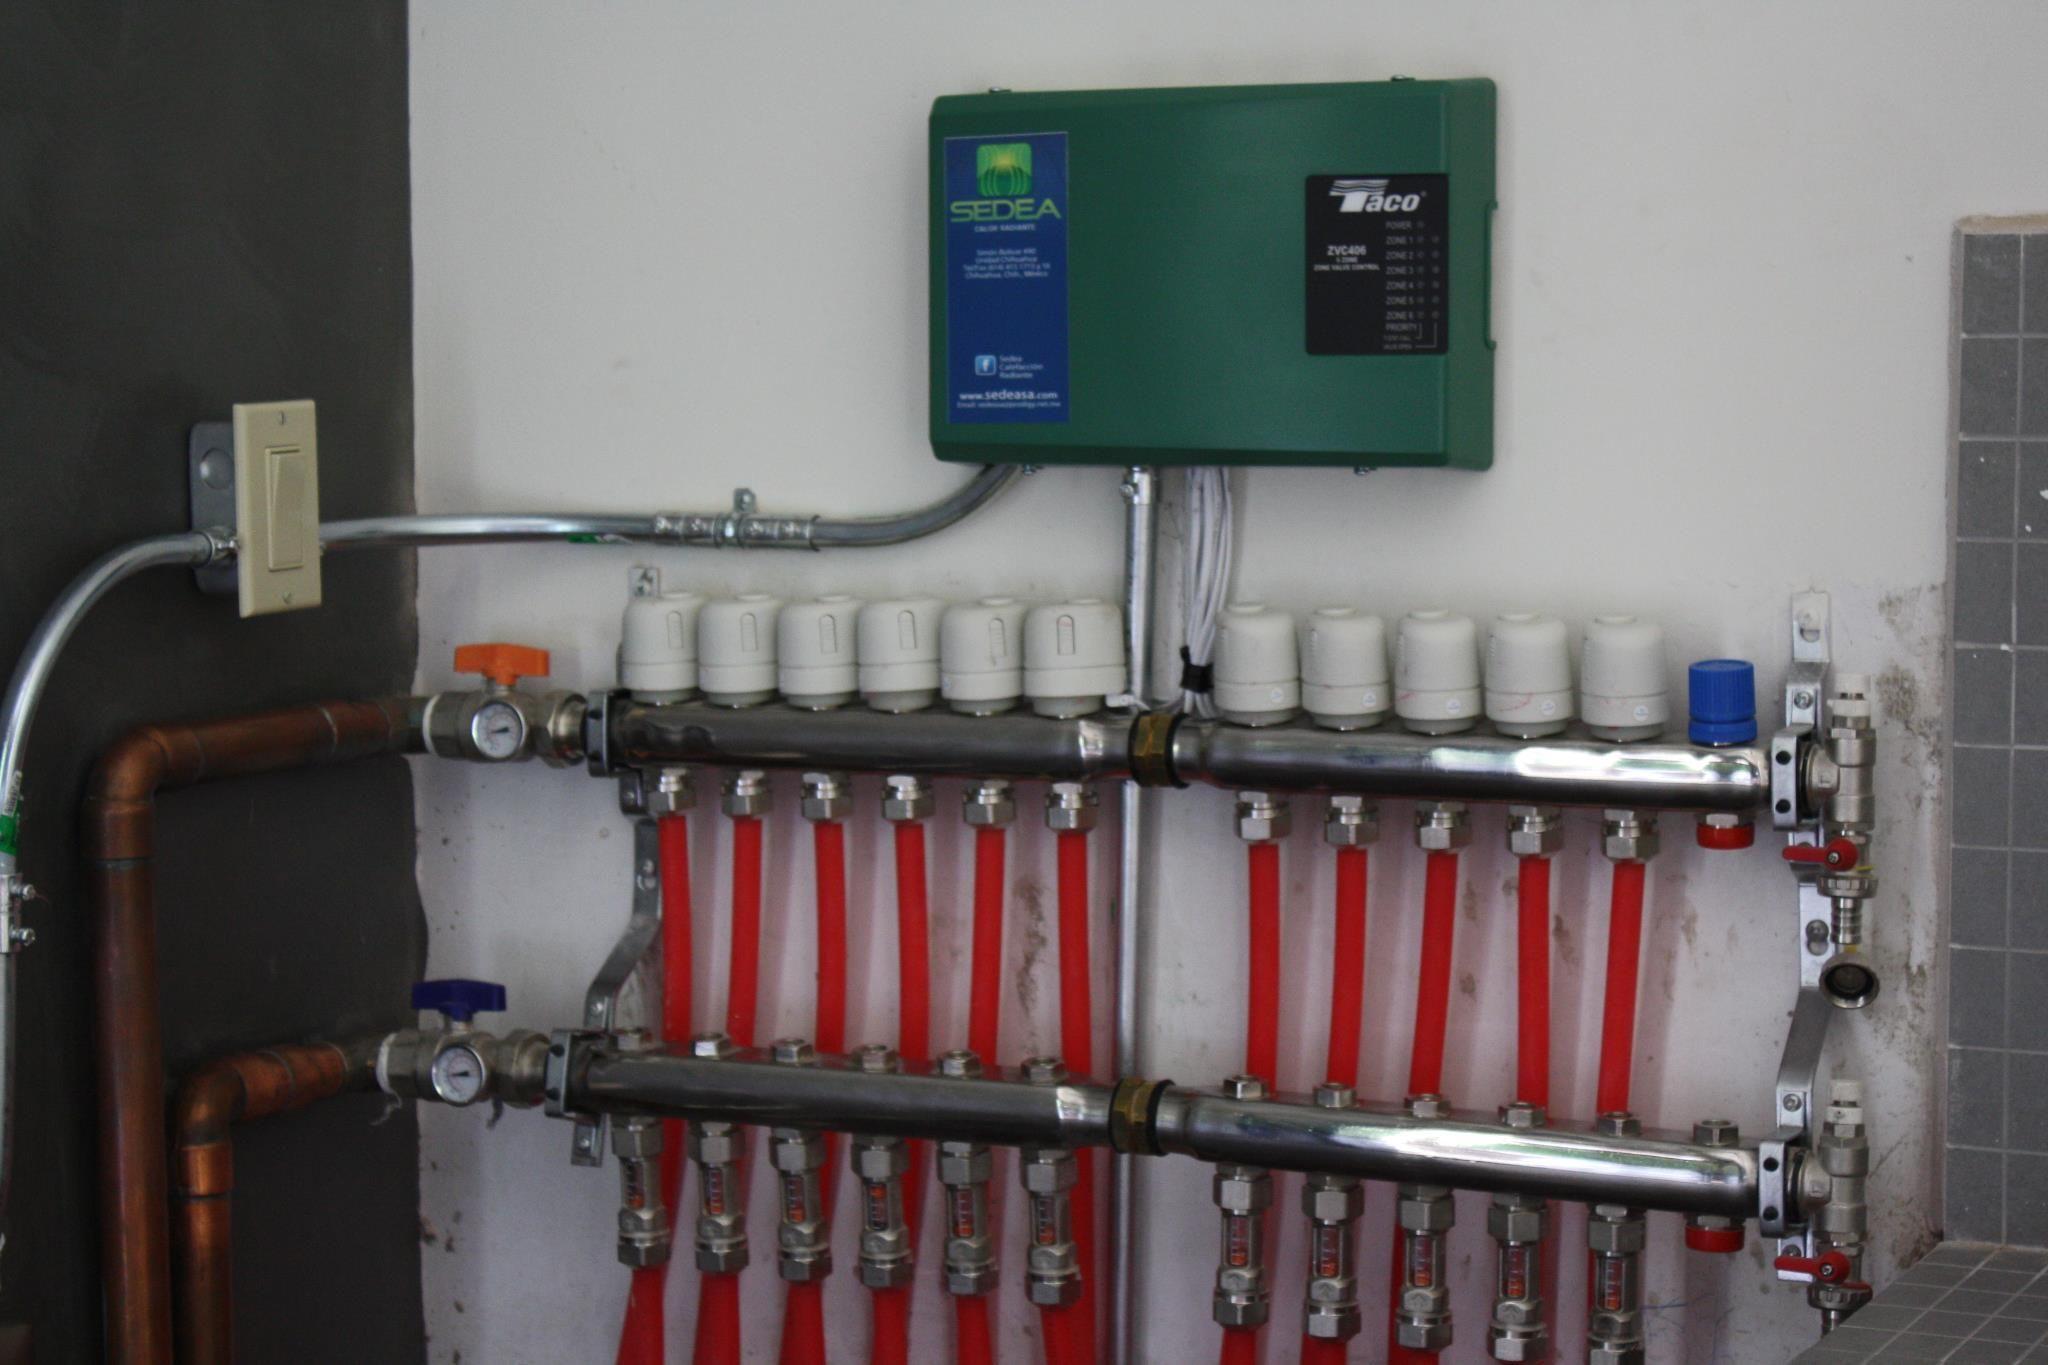 Manifolds y Taco zone control valves. Control valves